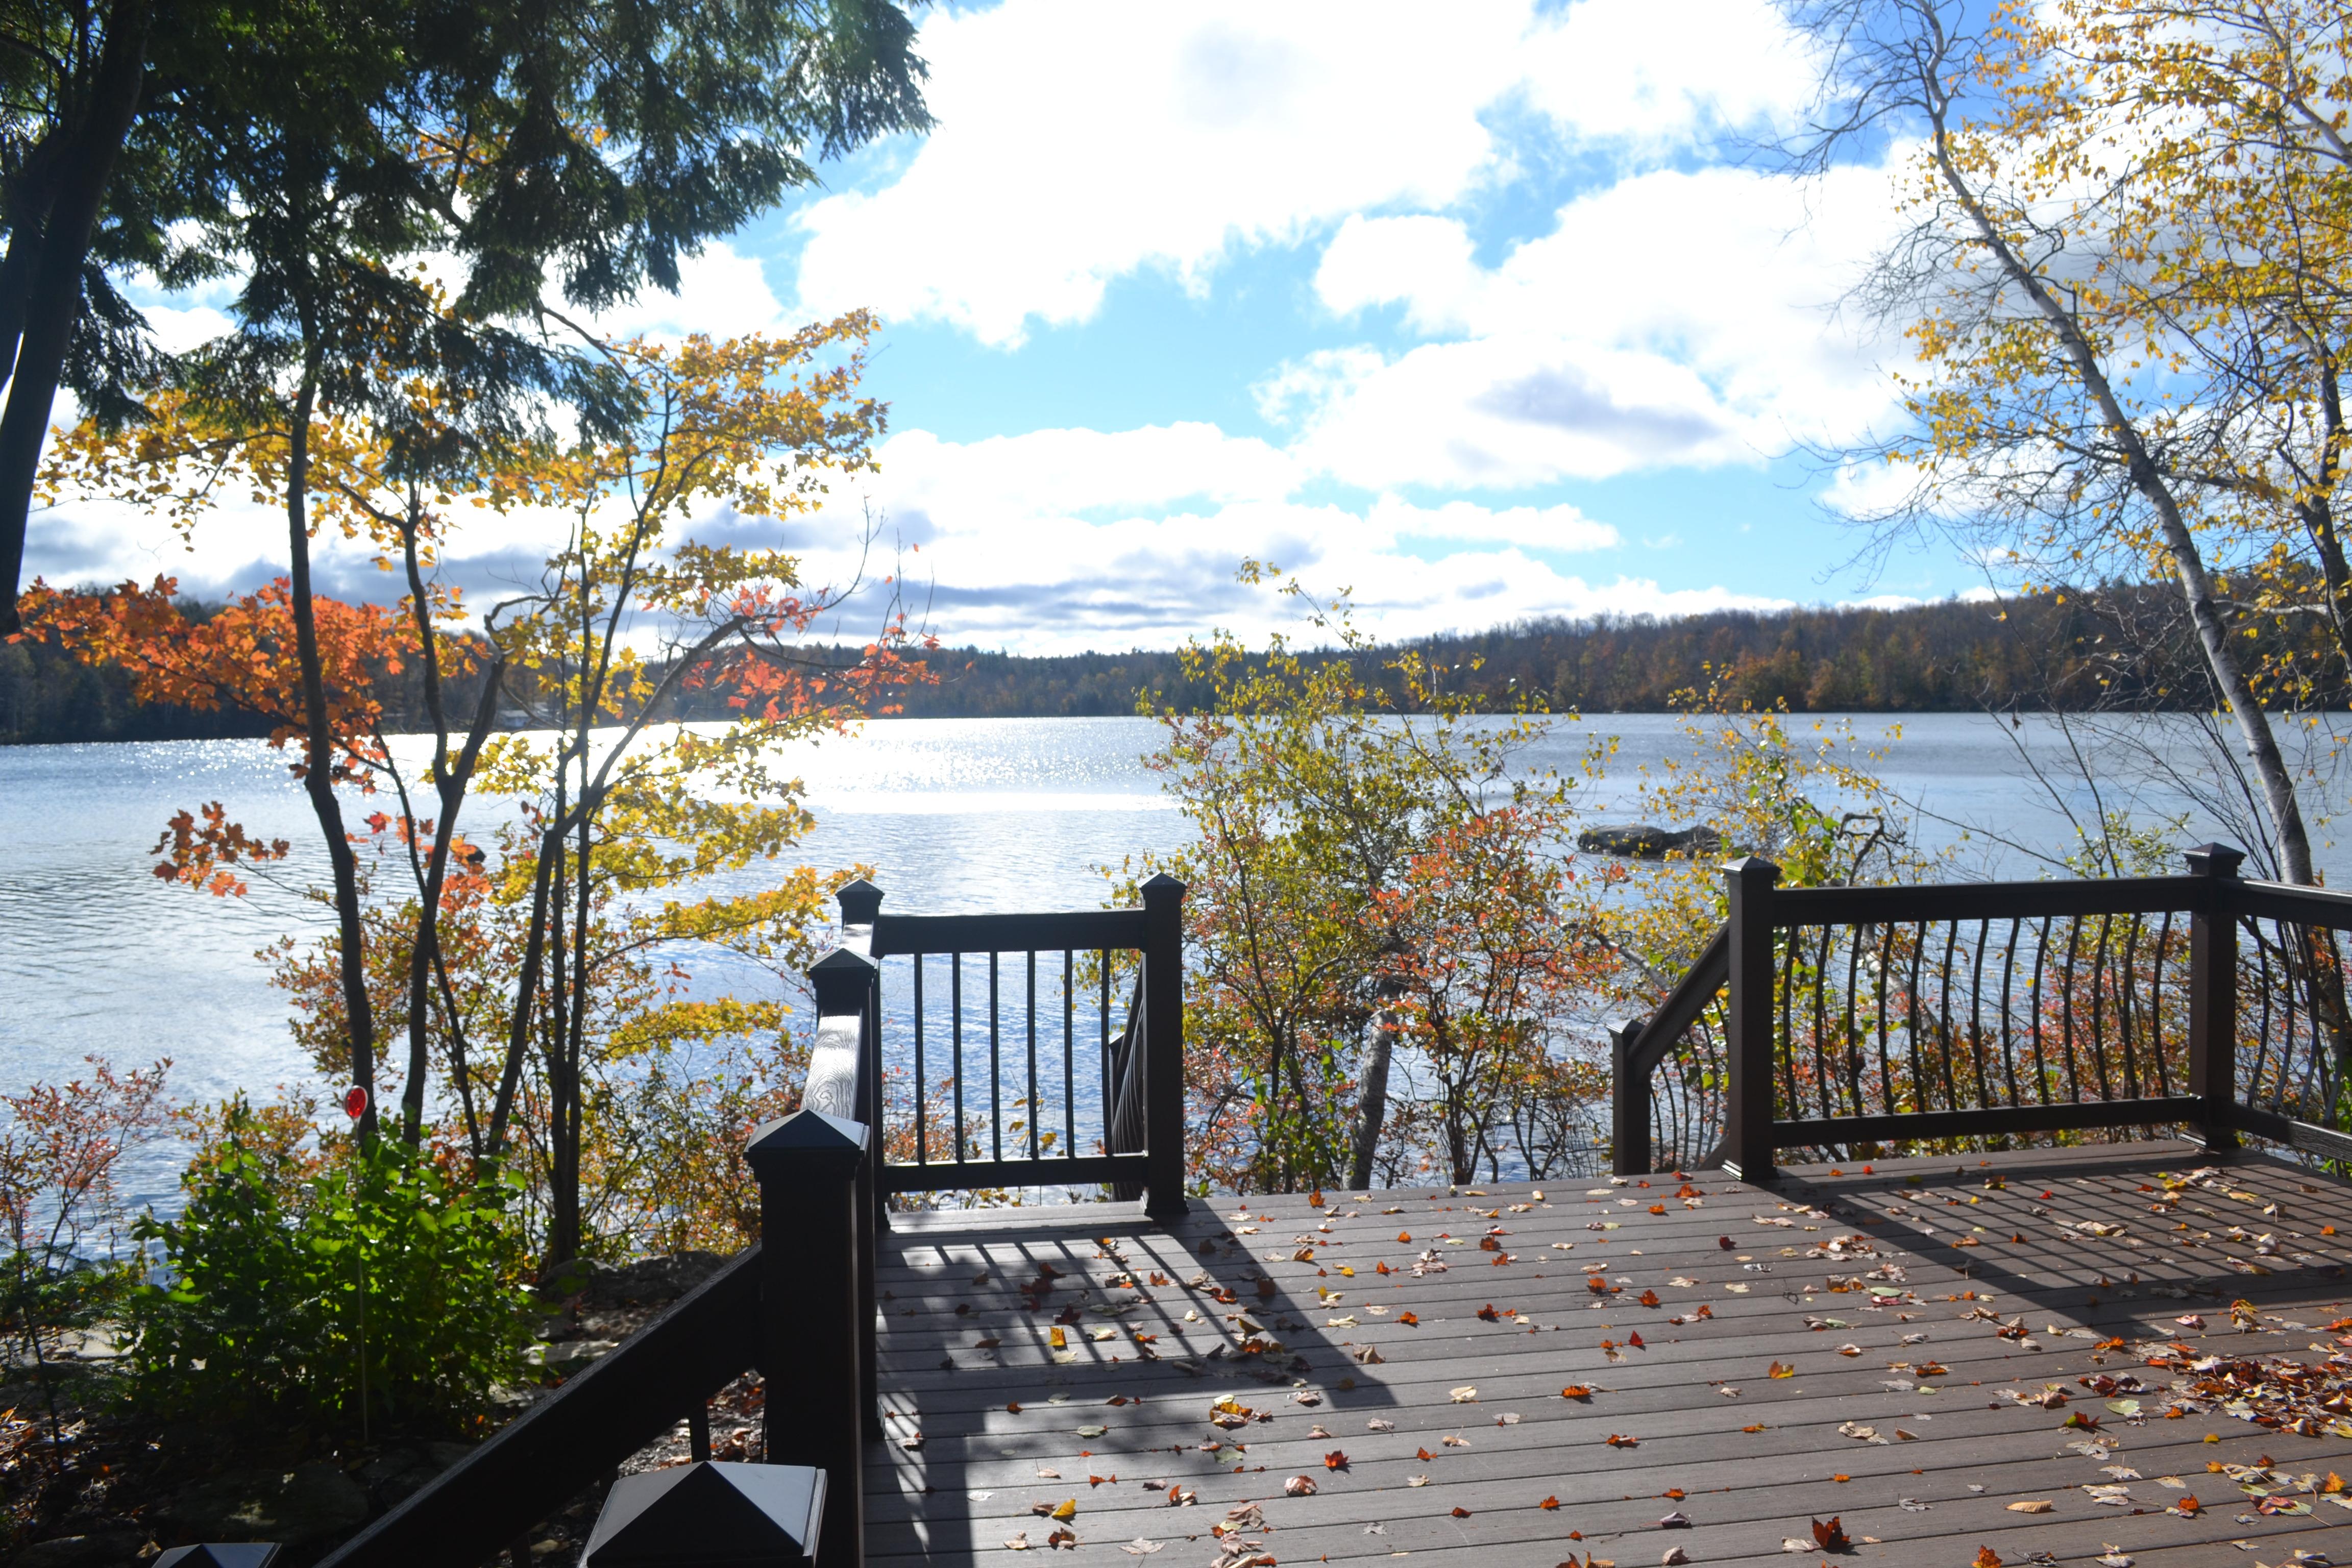 yokum pond deck permitting